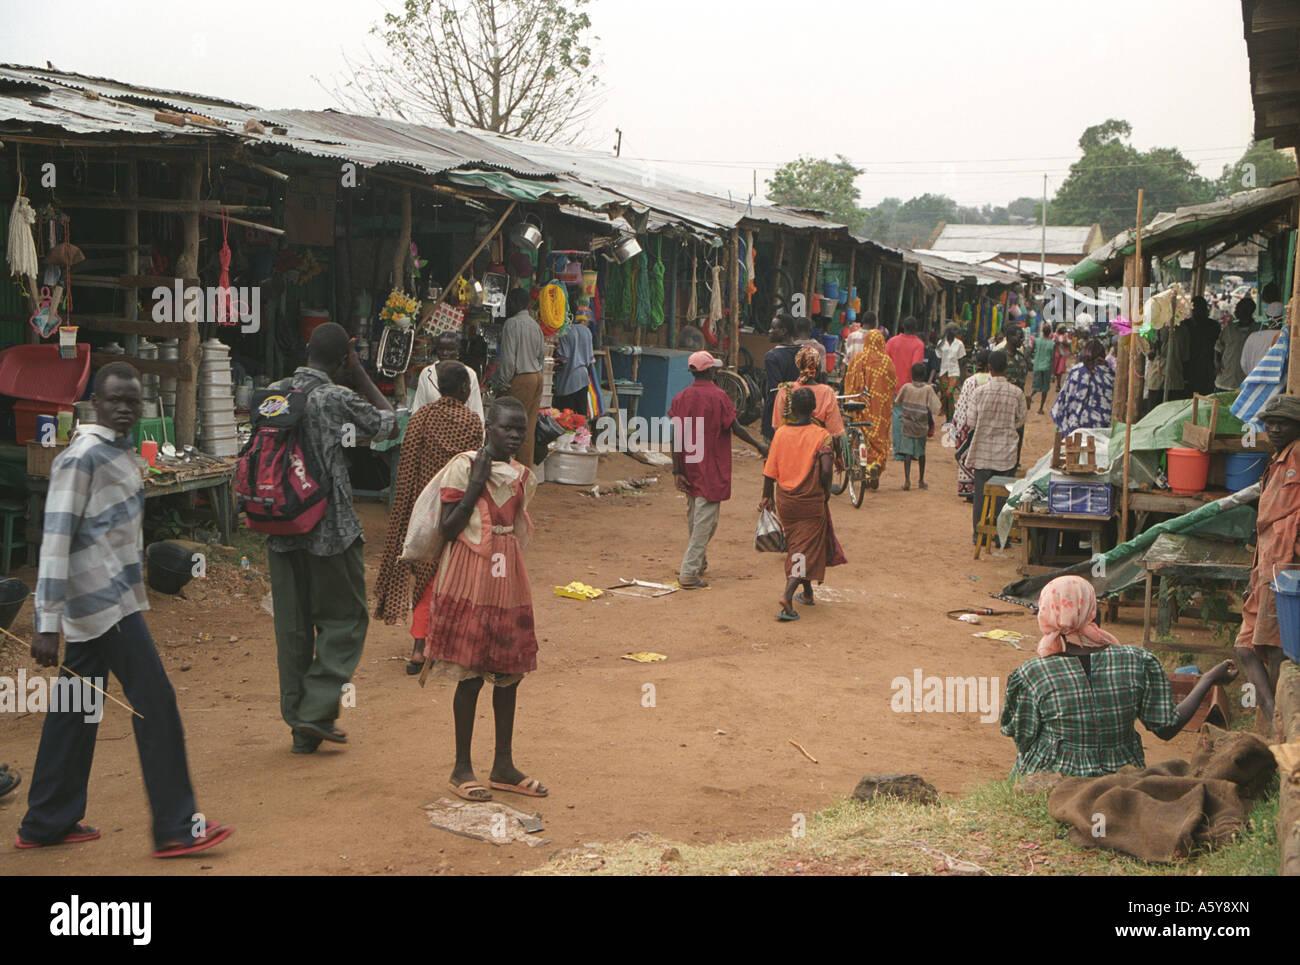 Market, Juba, South Sudan - Stock Image